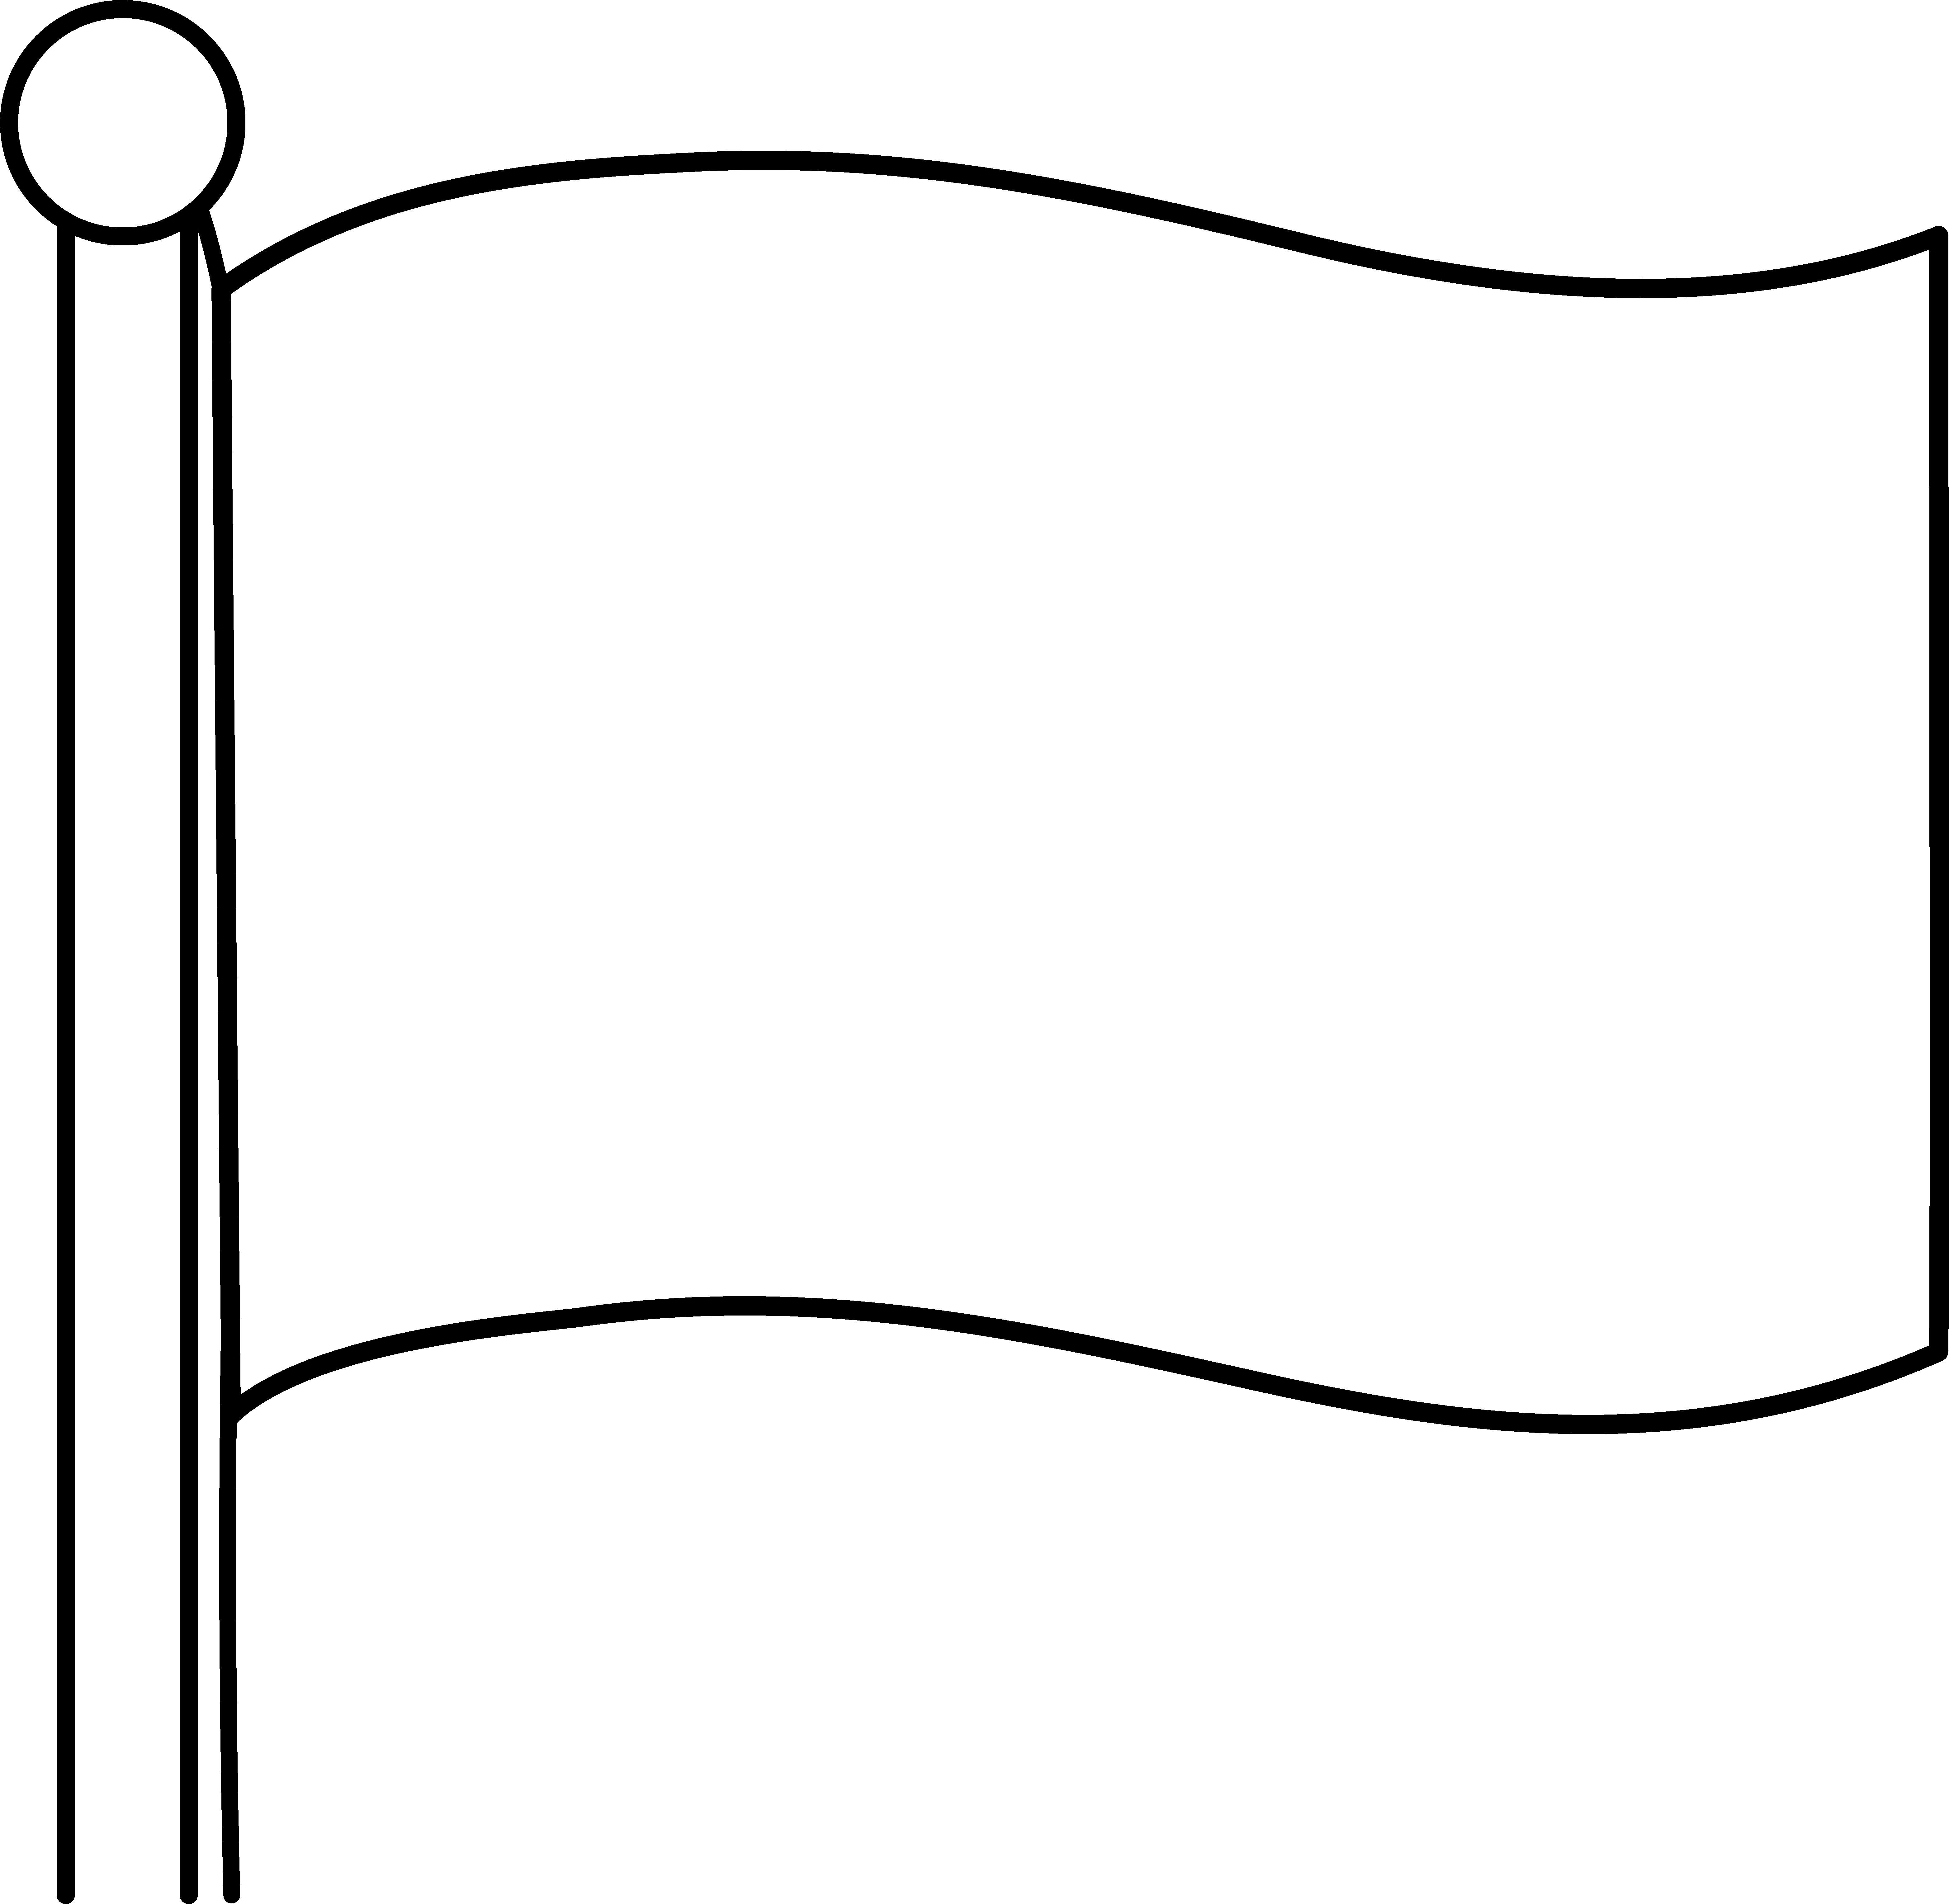 Simple Blank Flag Design.